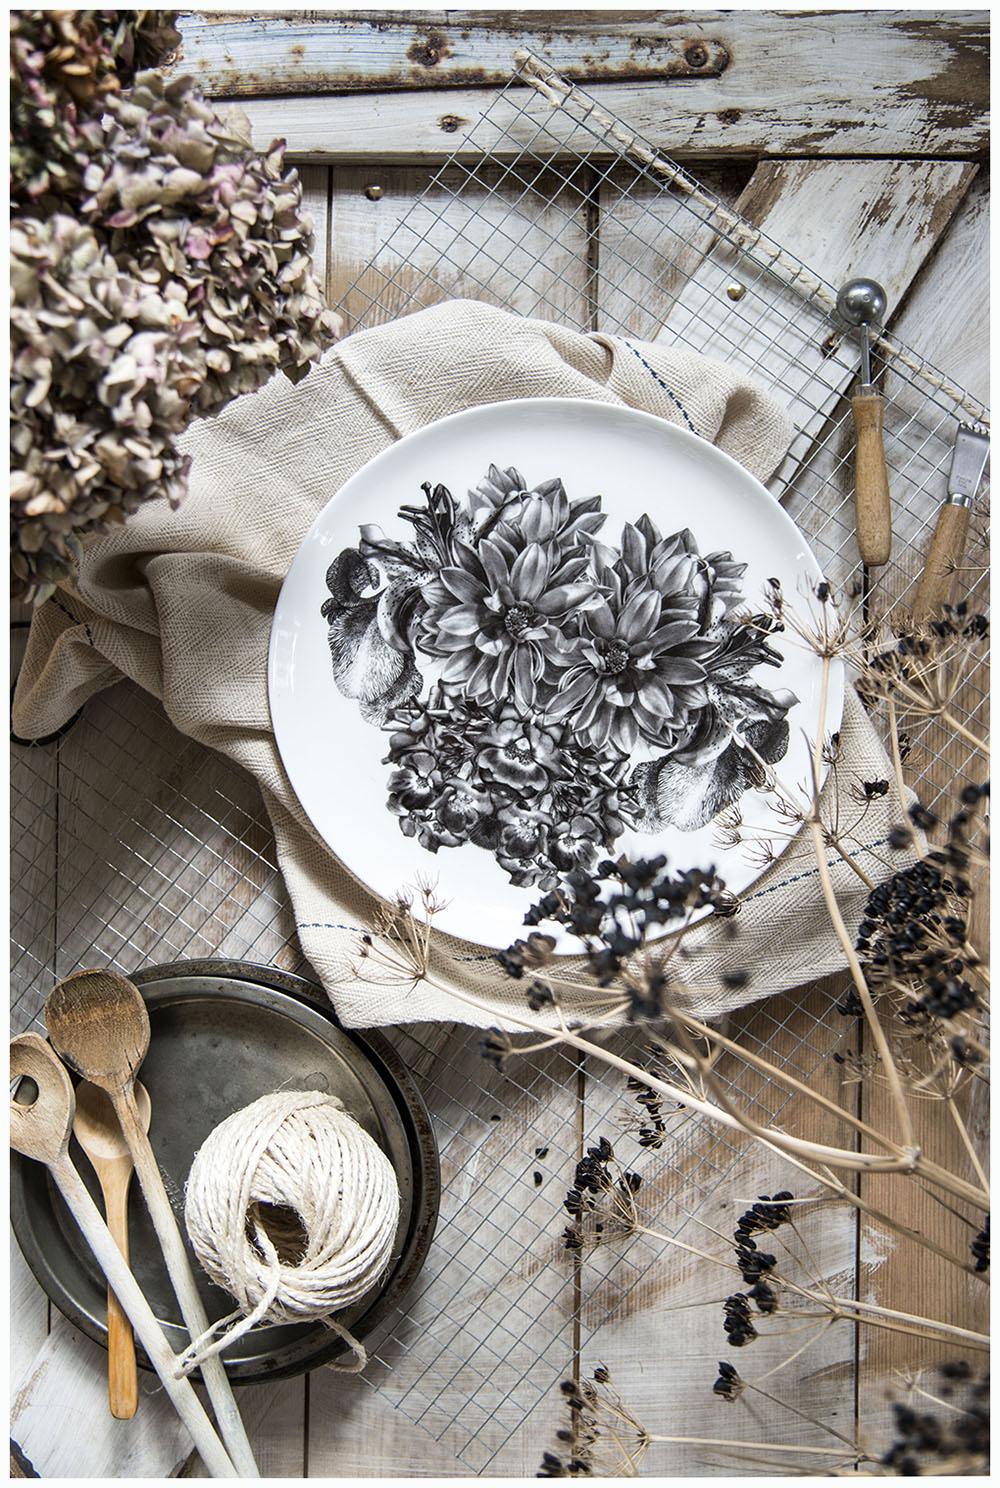 Styling a plate by Sasha Tugolukova